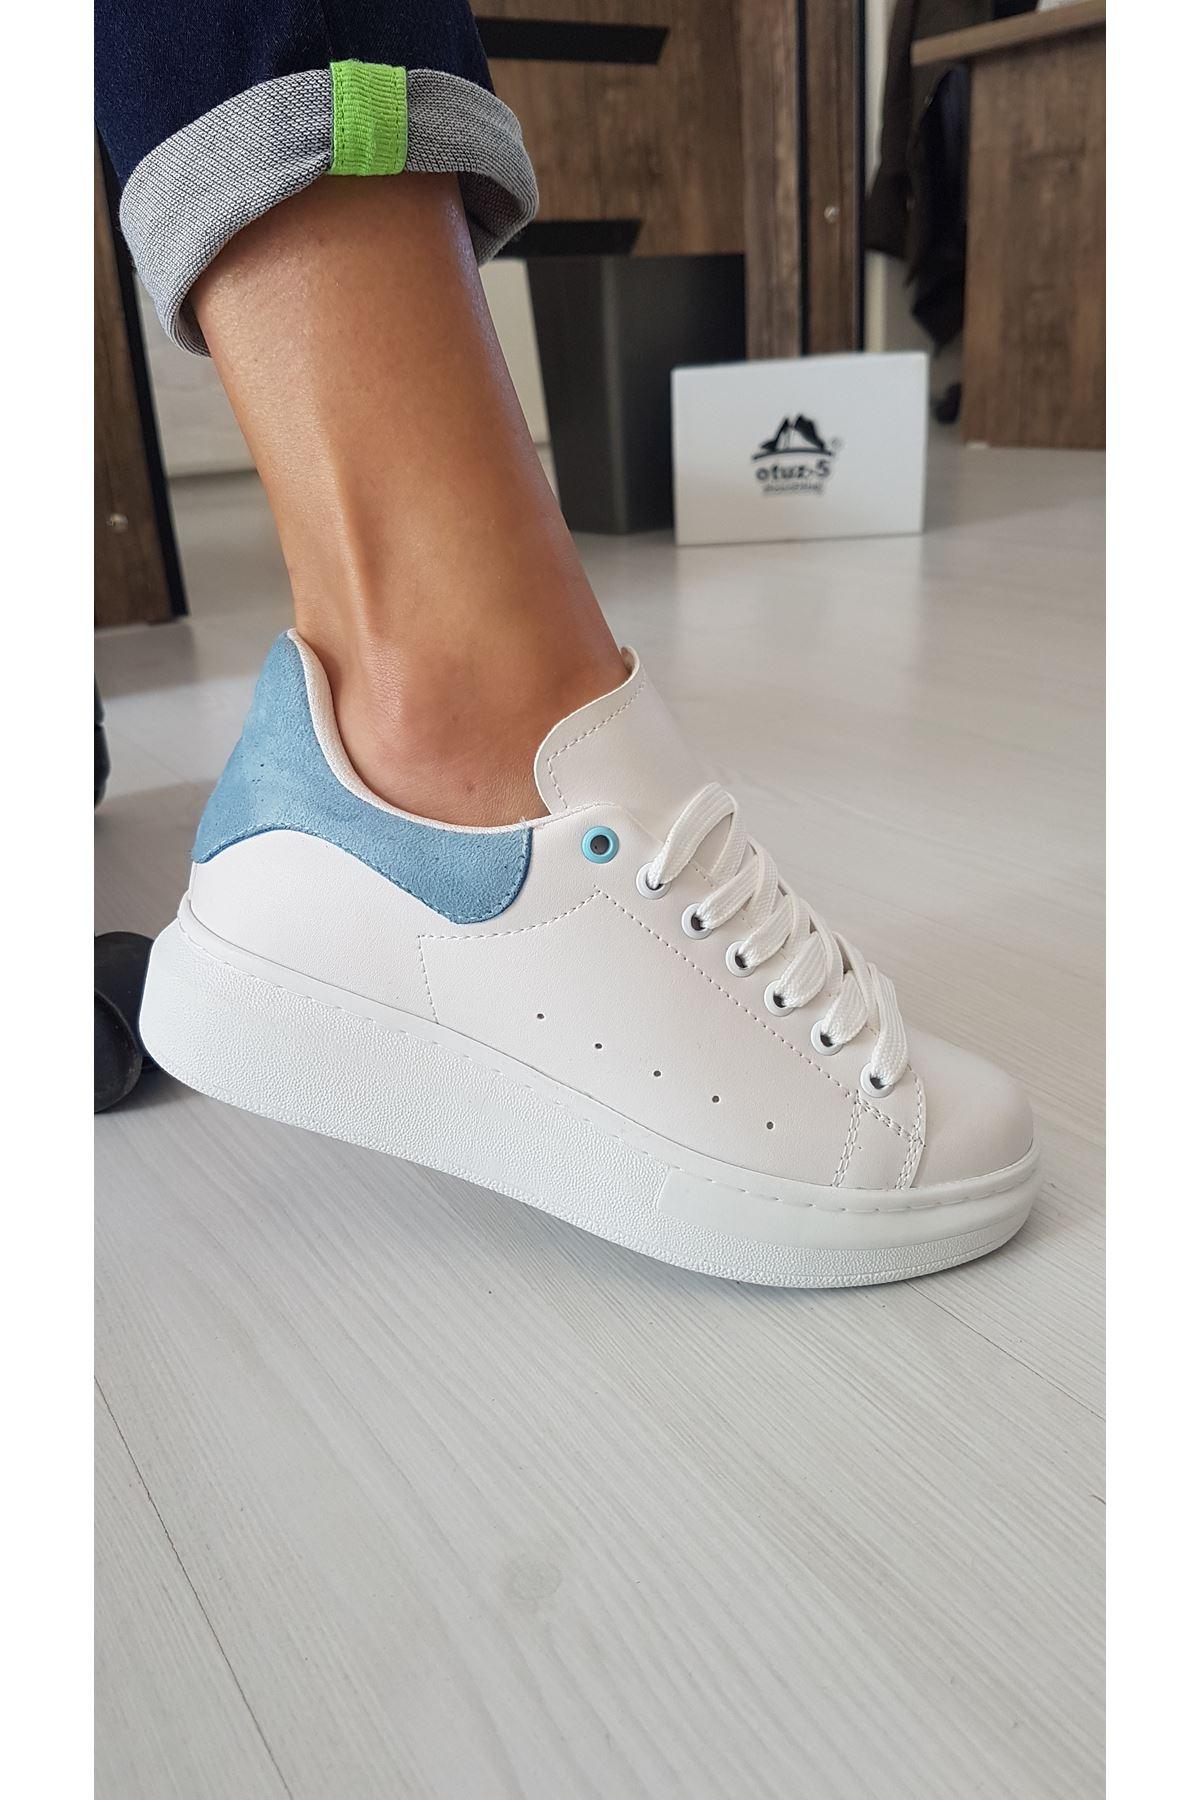 Lucy Mat Deri Bebek Mavi Süet Detay Sneakers Beyaz